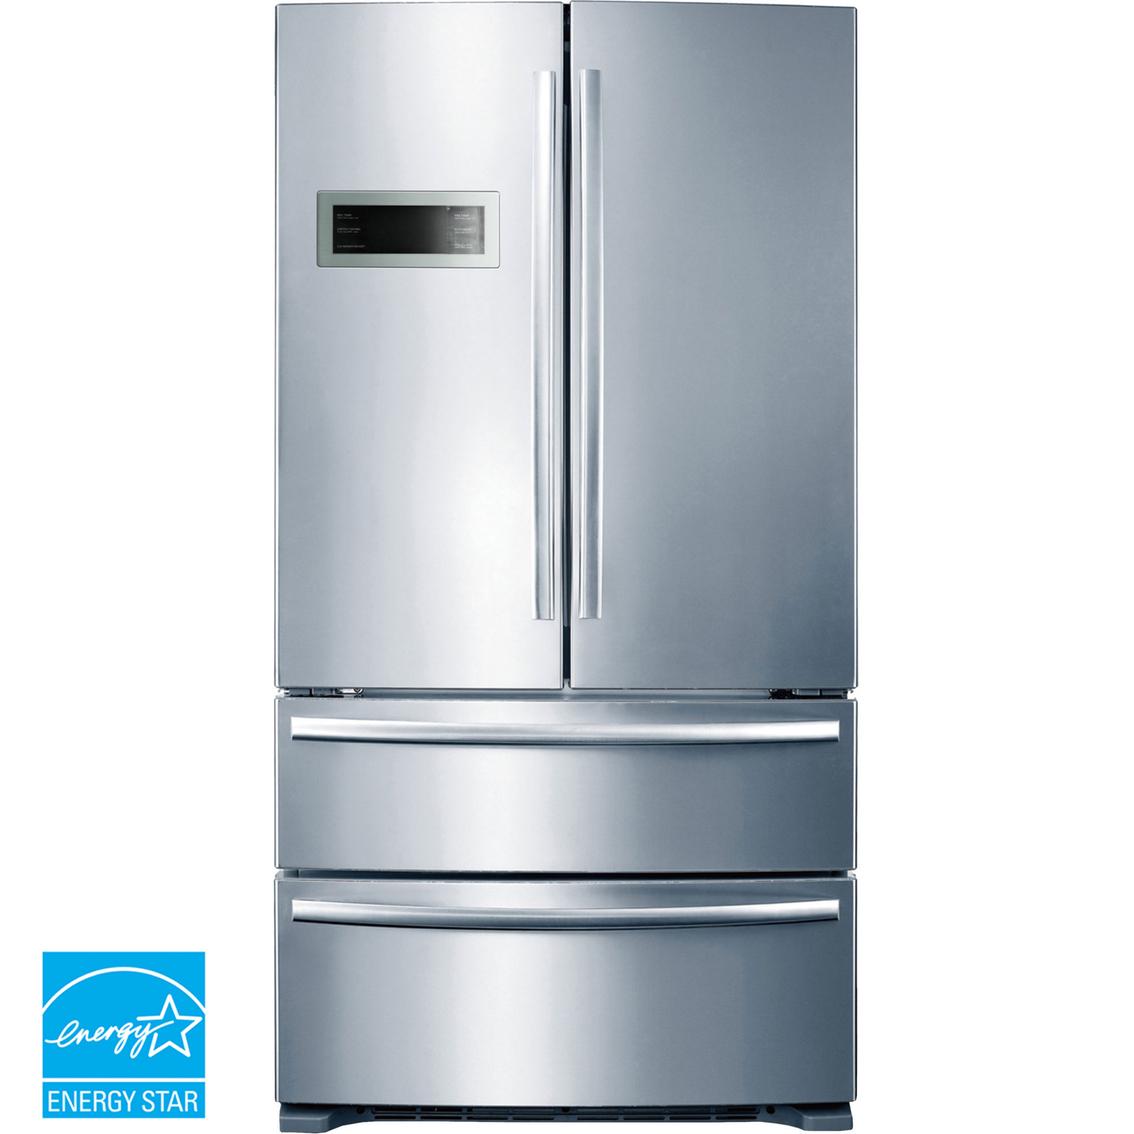 Midea Appliances: Midea 20.8 Cu. Ft. French Door Refrigerator